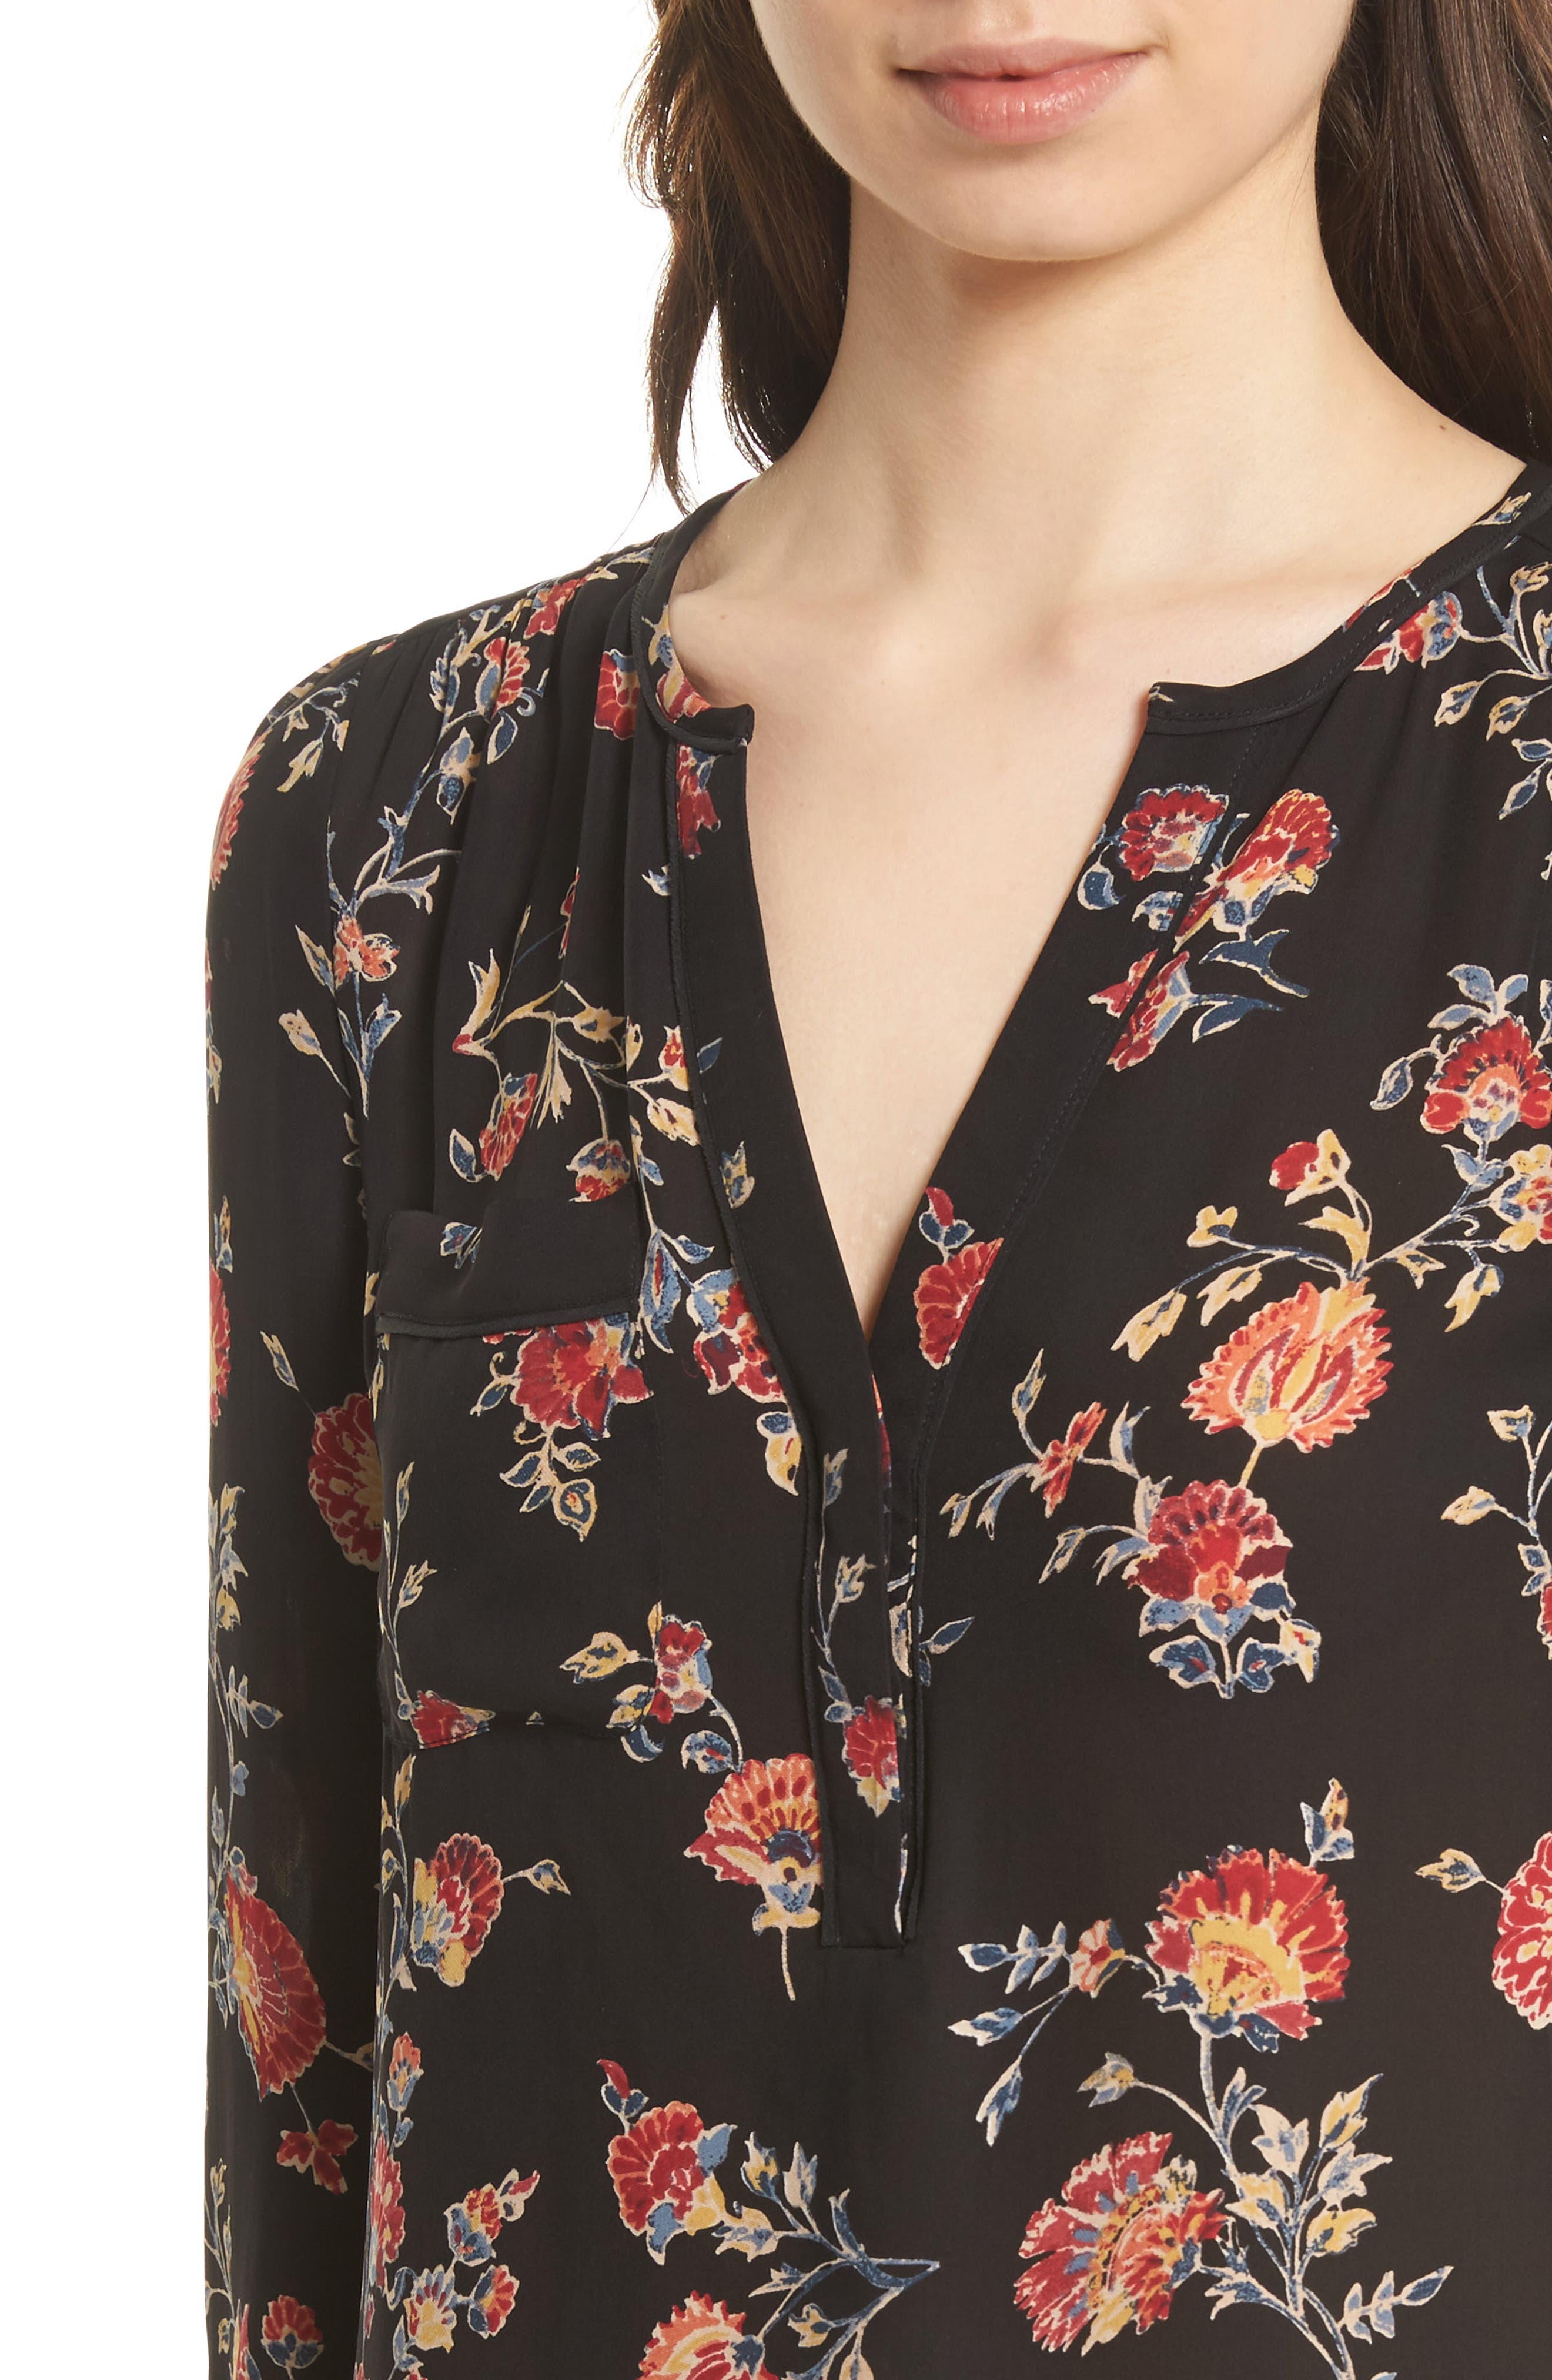 Brittin Floral Silk Top,                             Alternate thumbnail 4, color,                             007